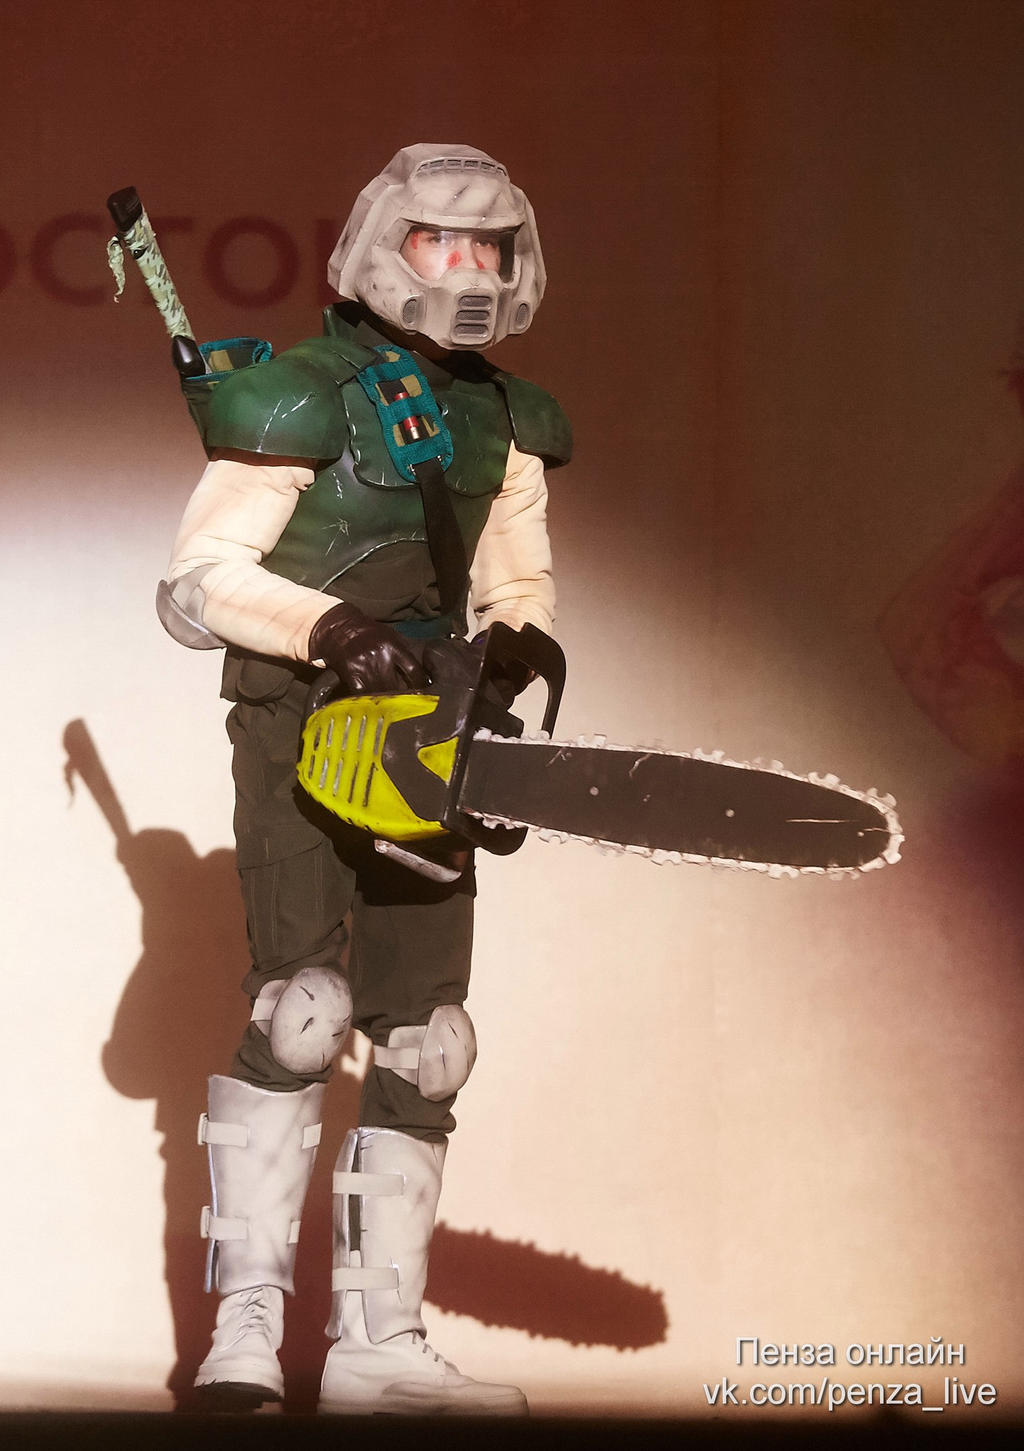 Doom Marine Costume By Beketov On DeviantArt